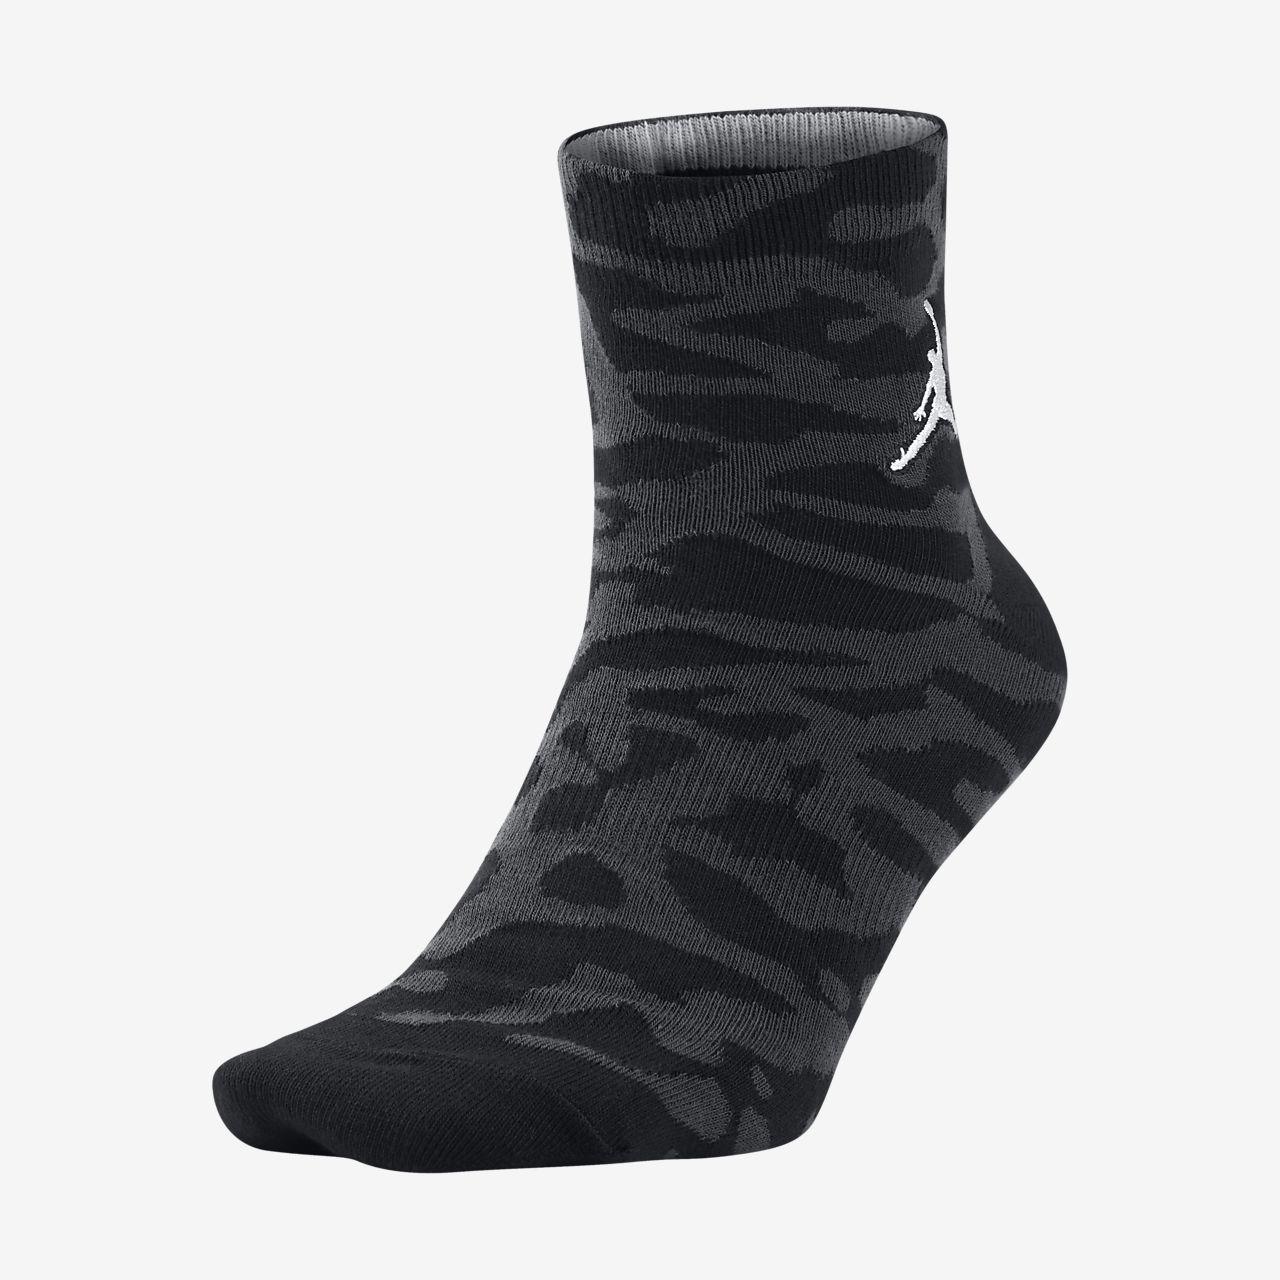 Jordan Elephant Print Quarter Socks